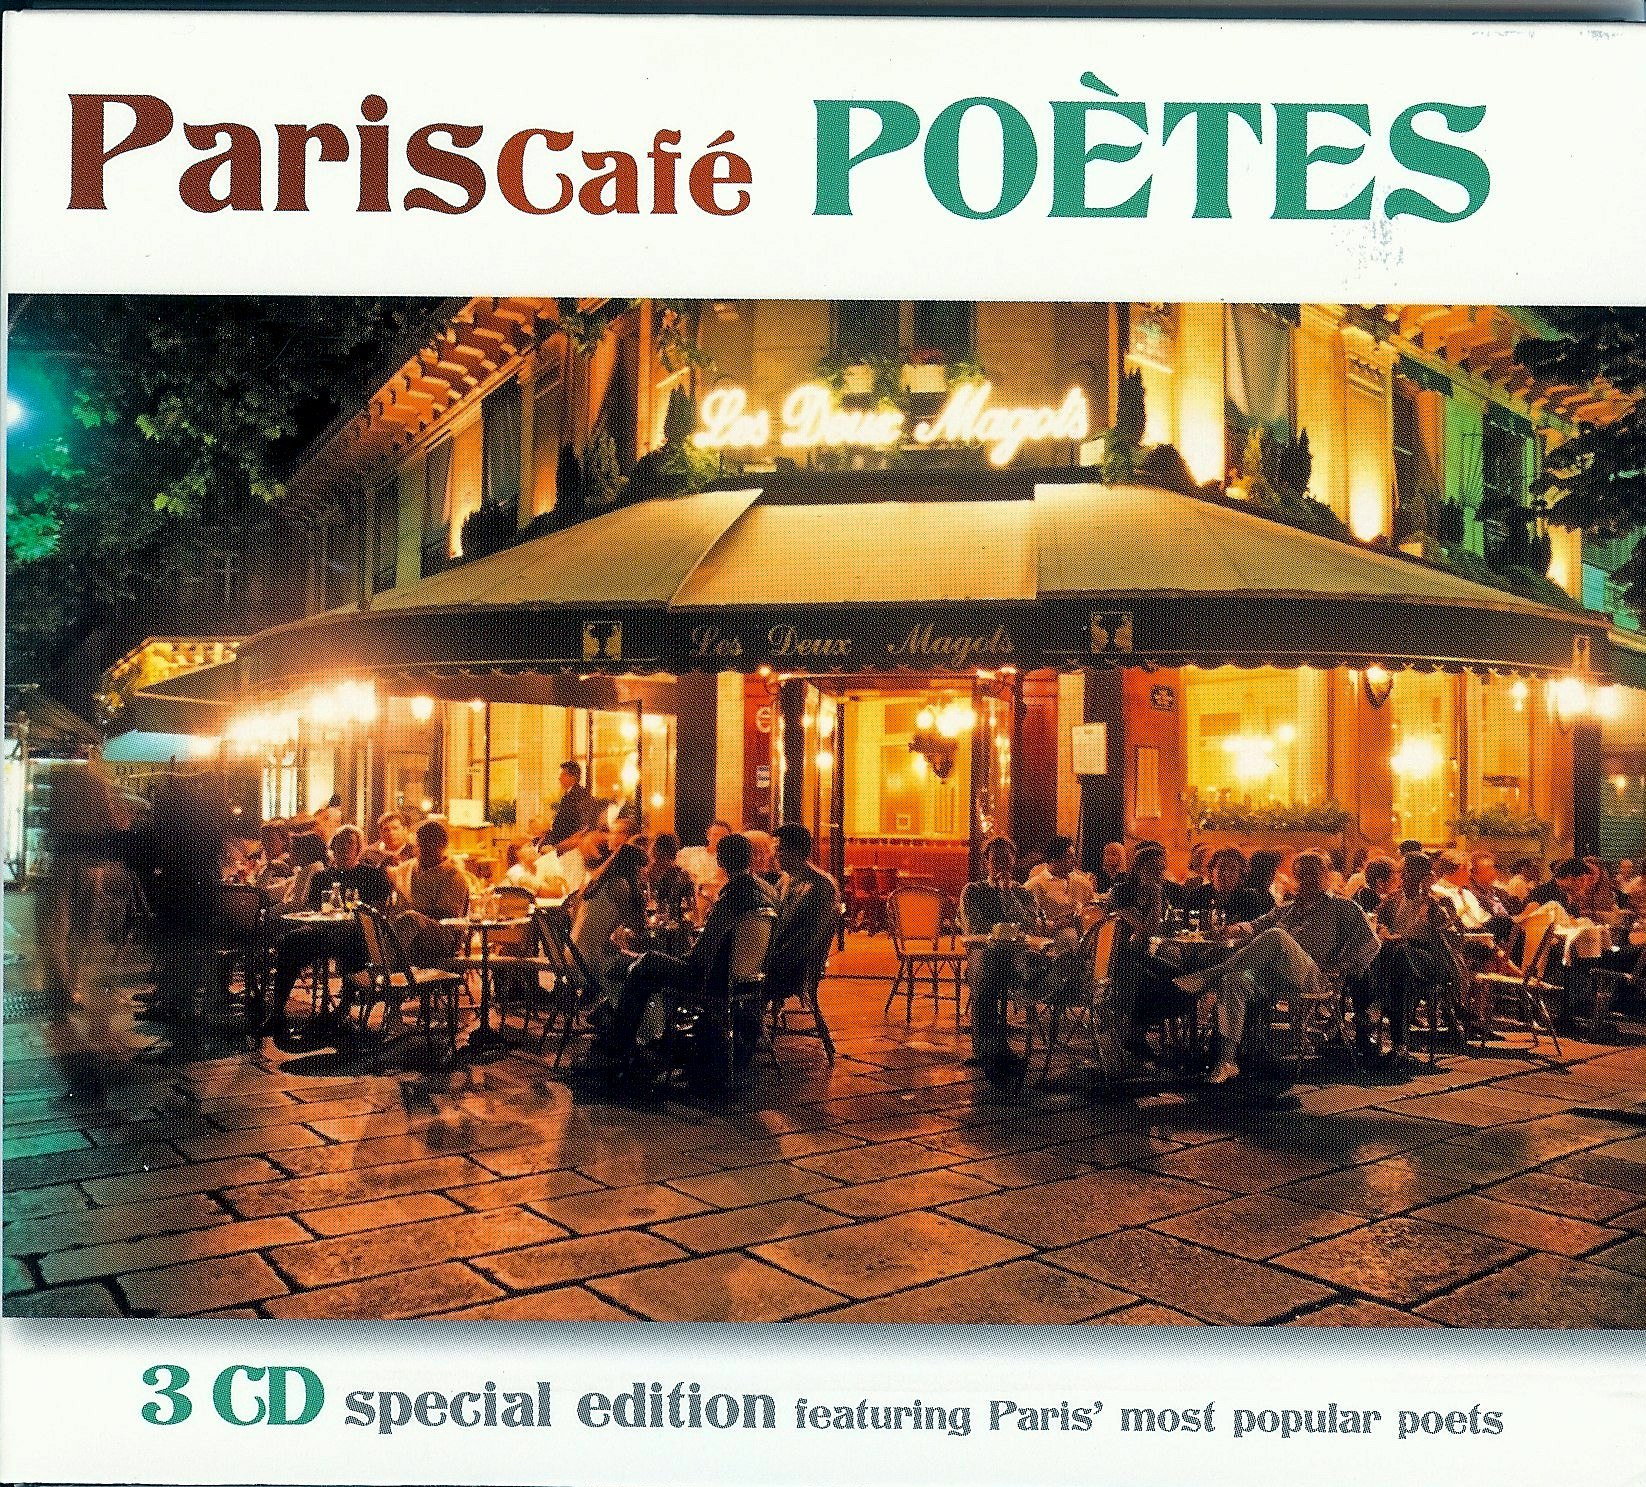 PARIS CAFE POETES